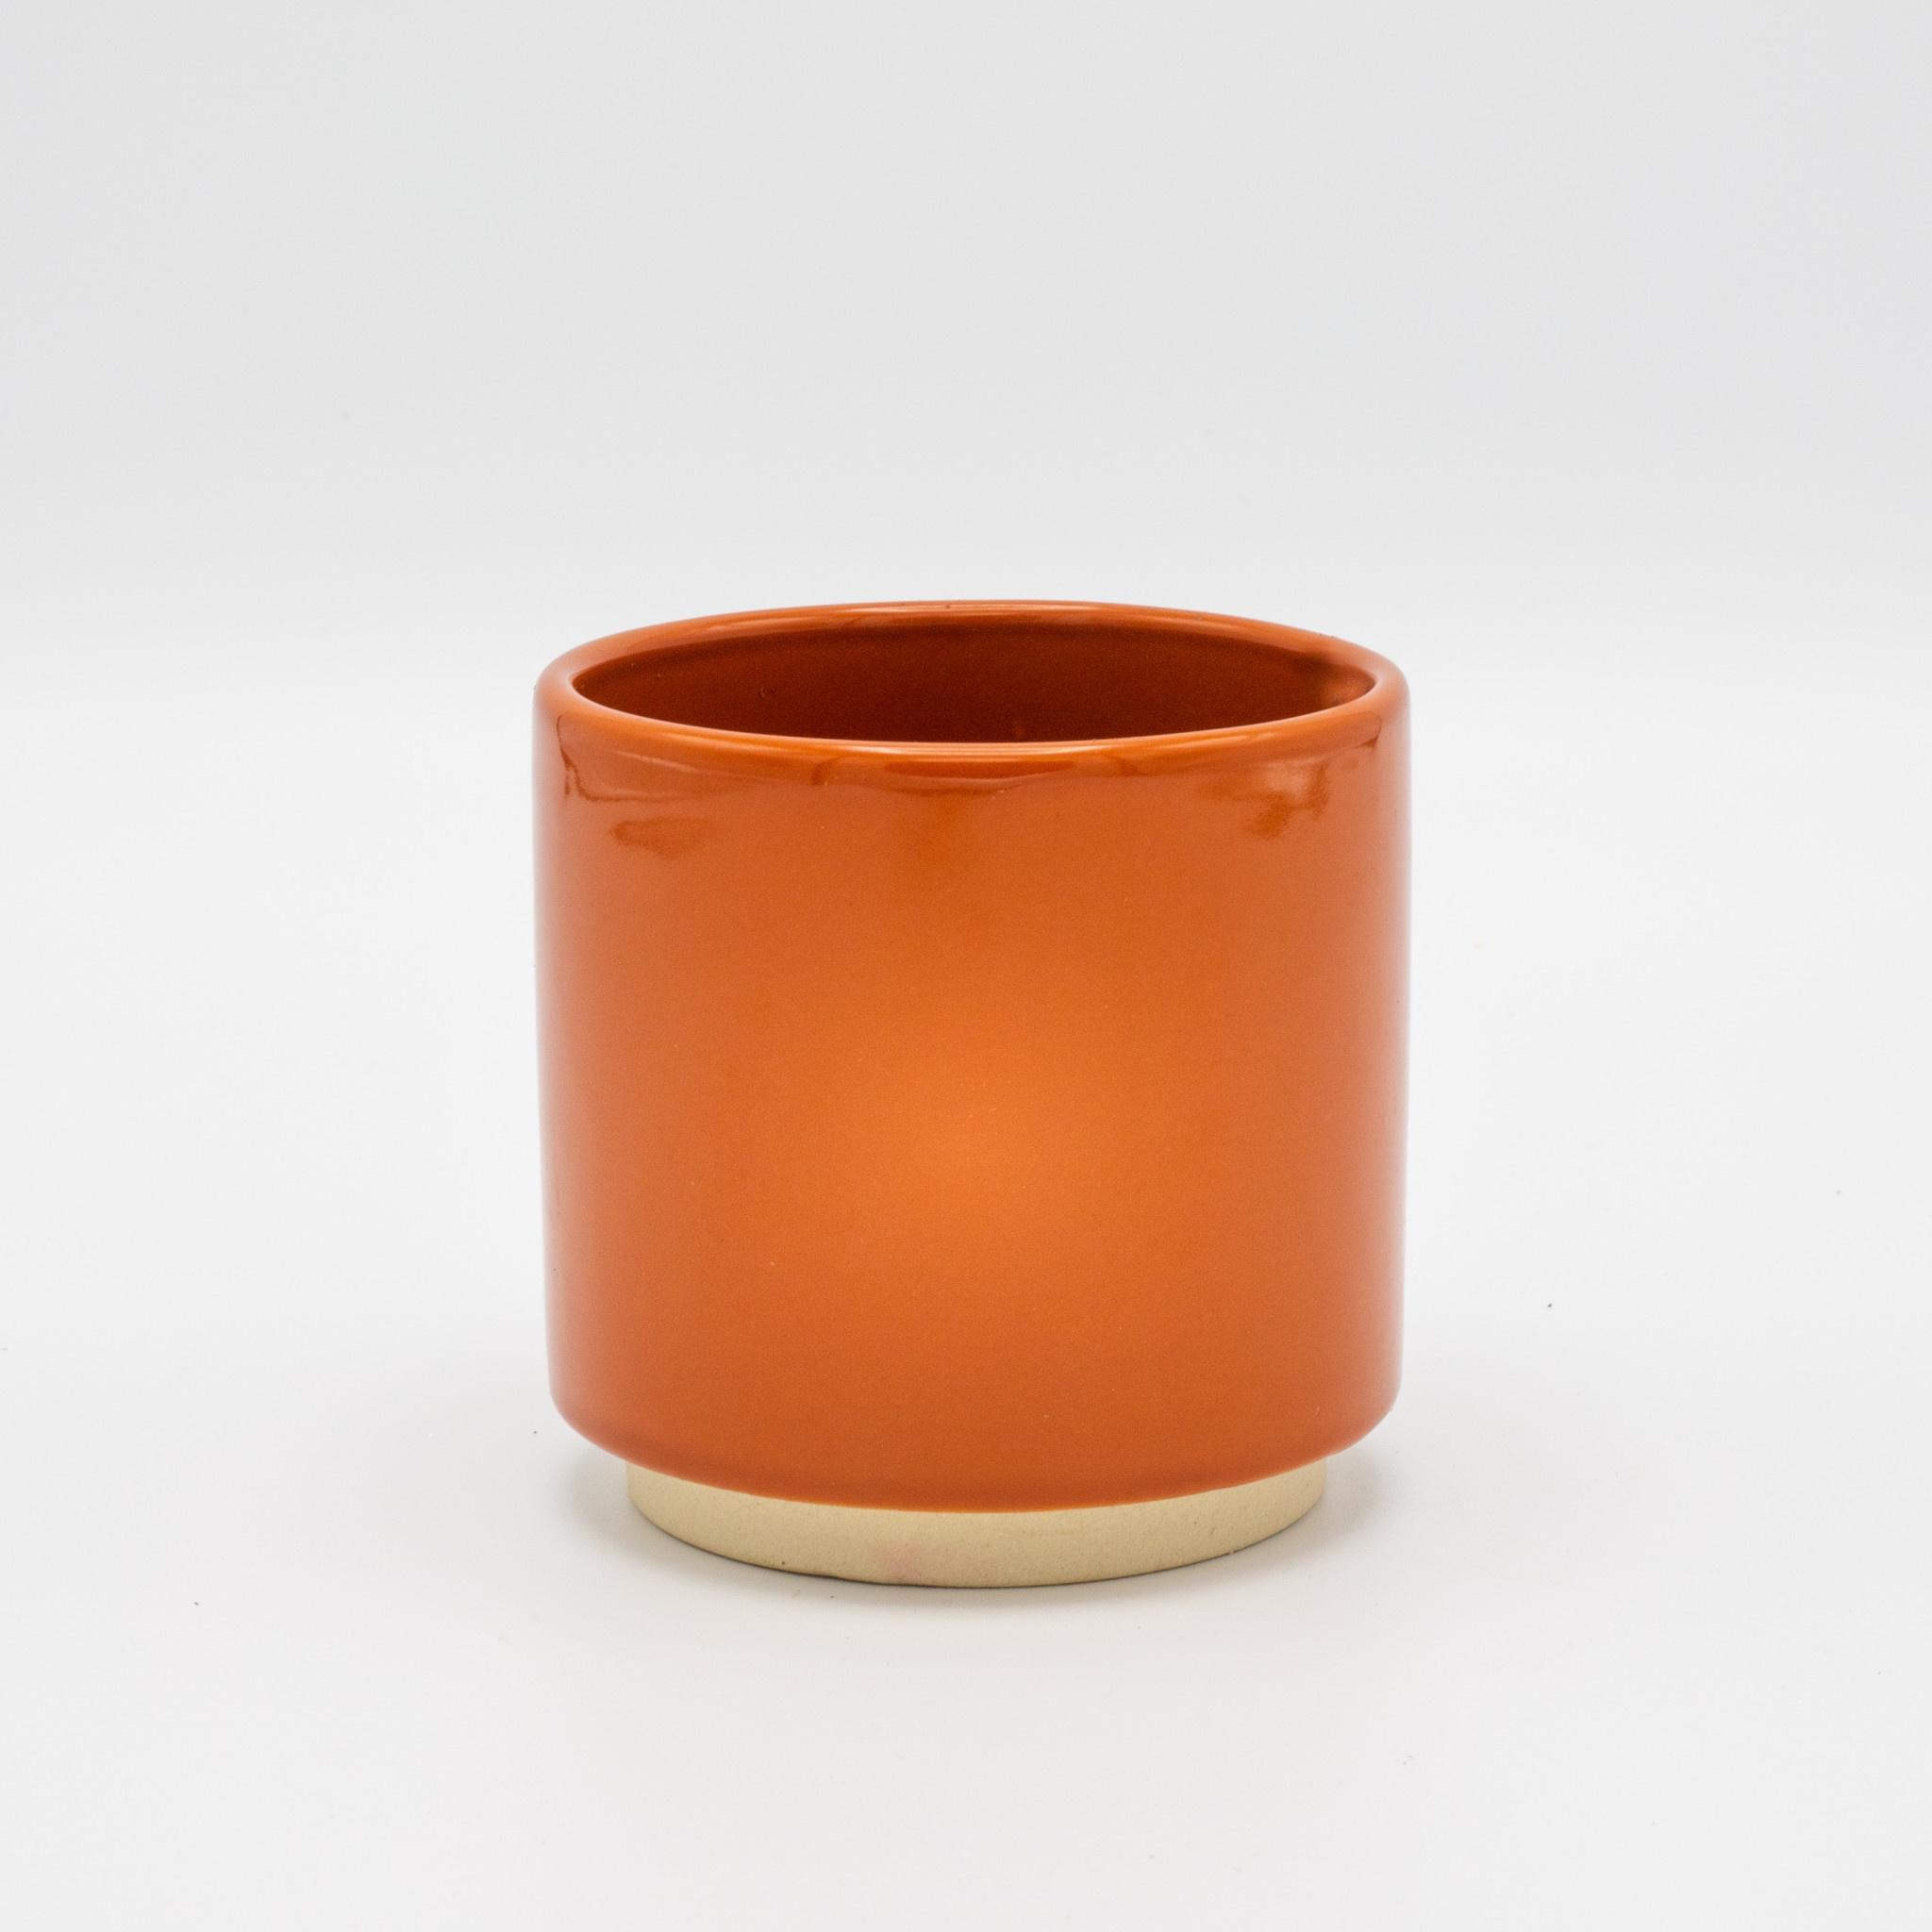 Bloempot Terracotta - Medium-1